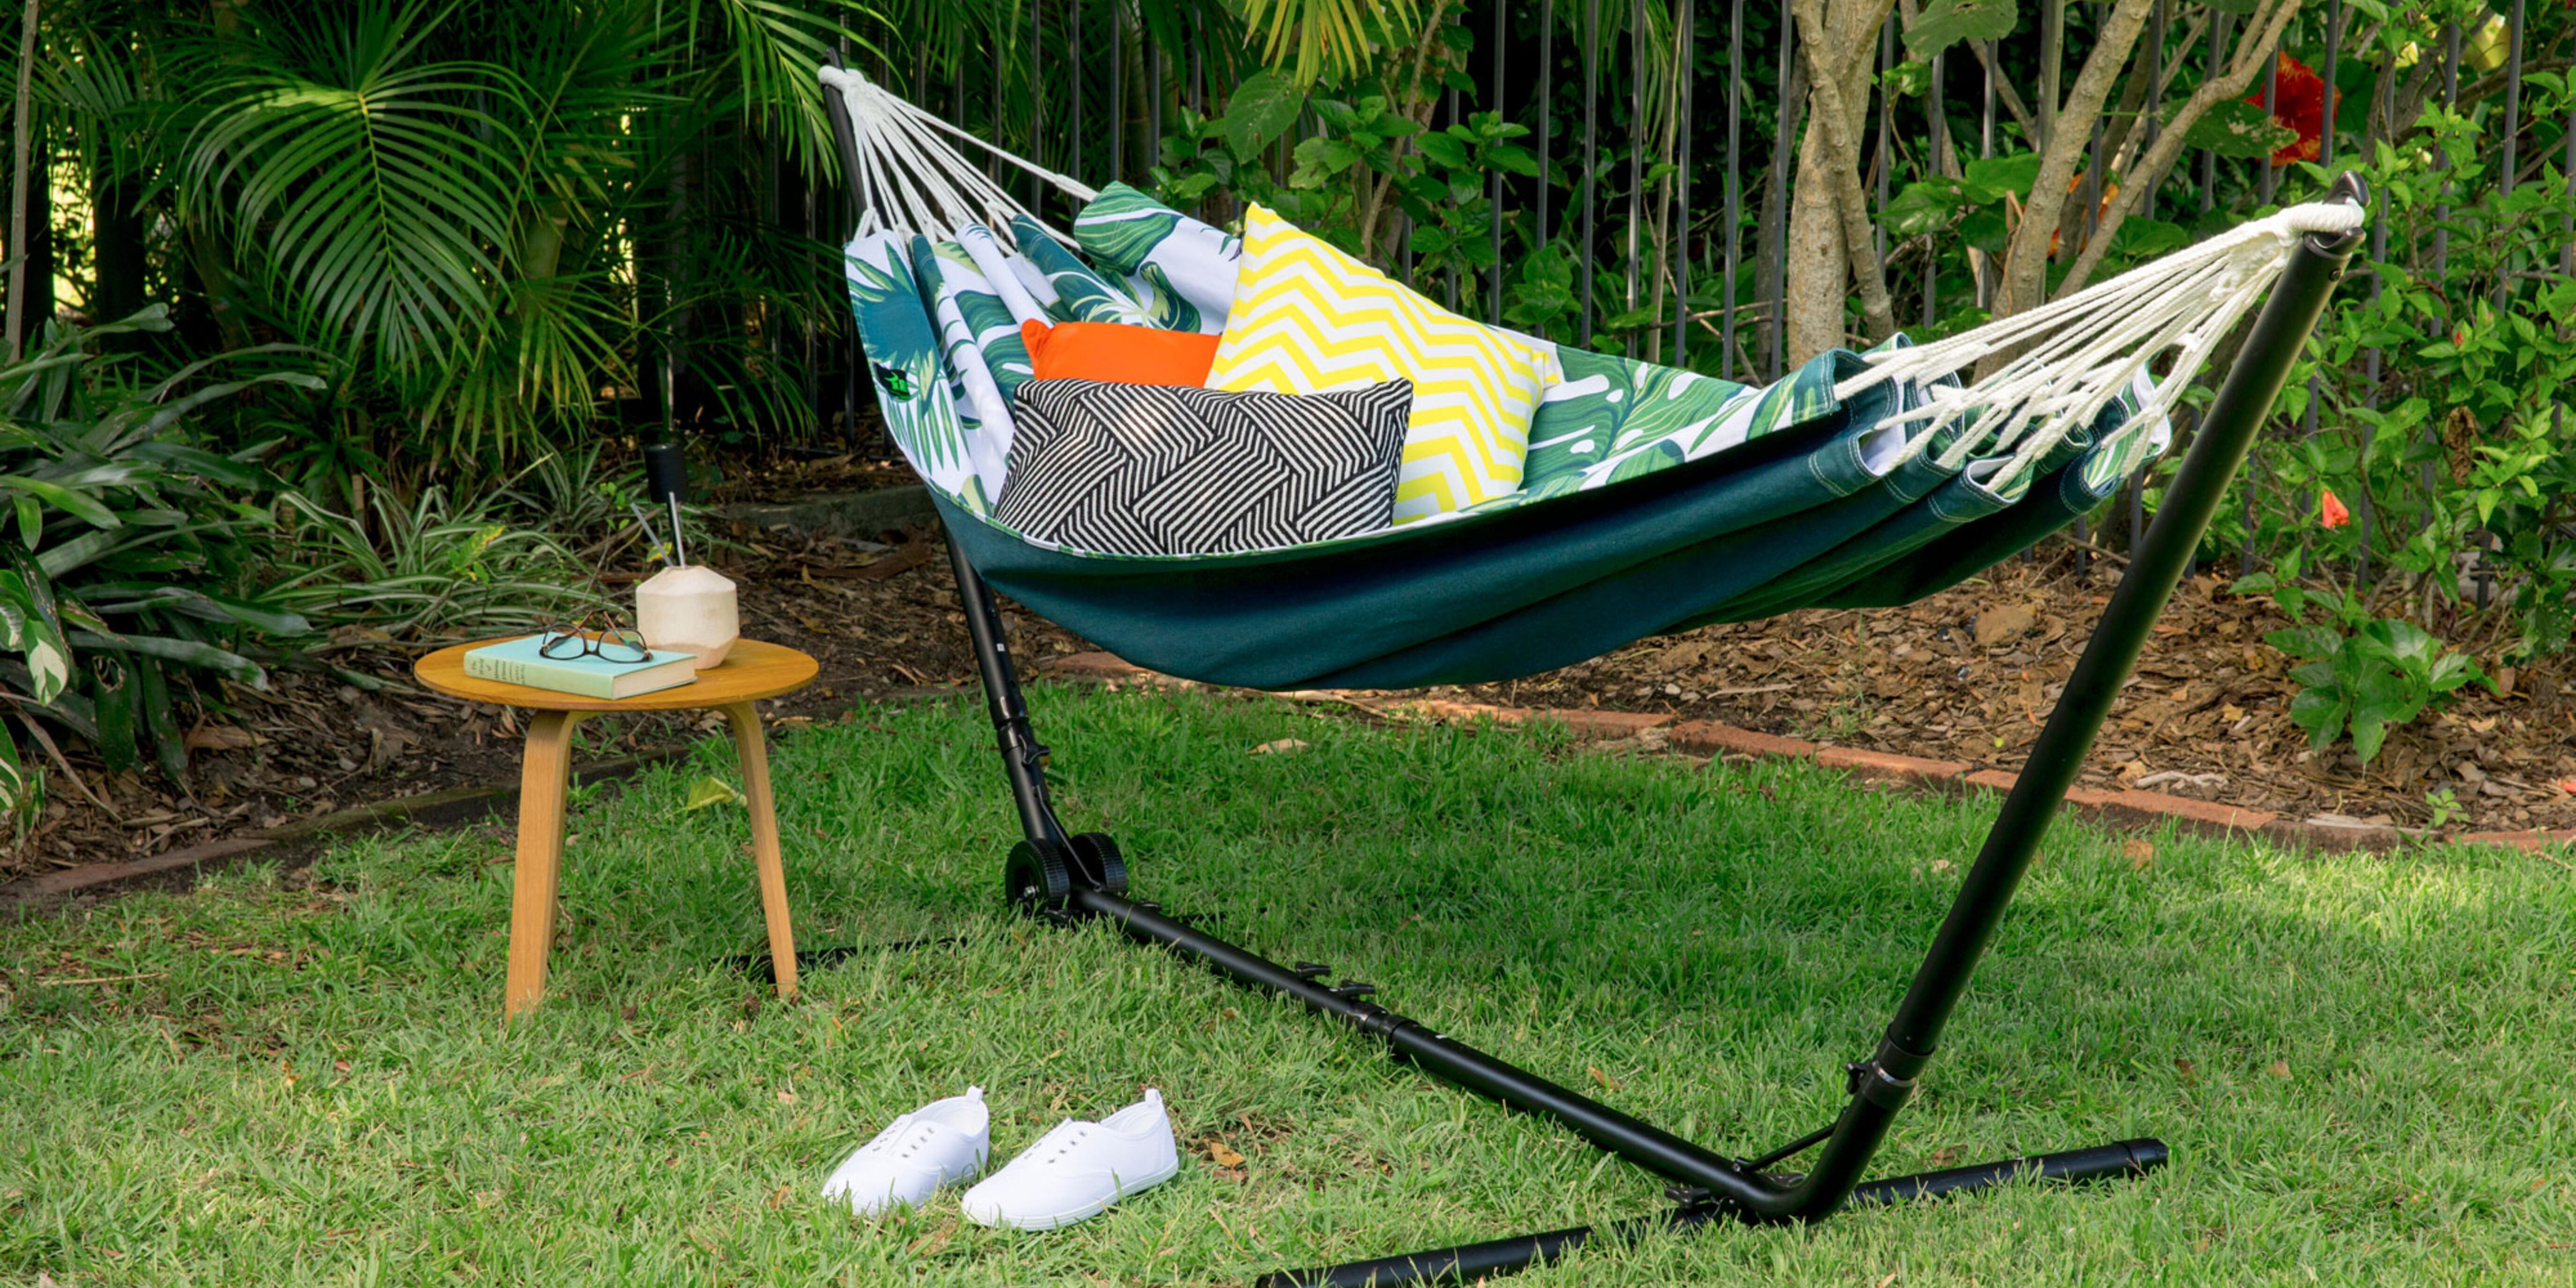 Empty hammock in a back yard